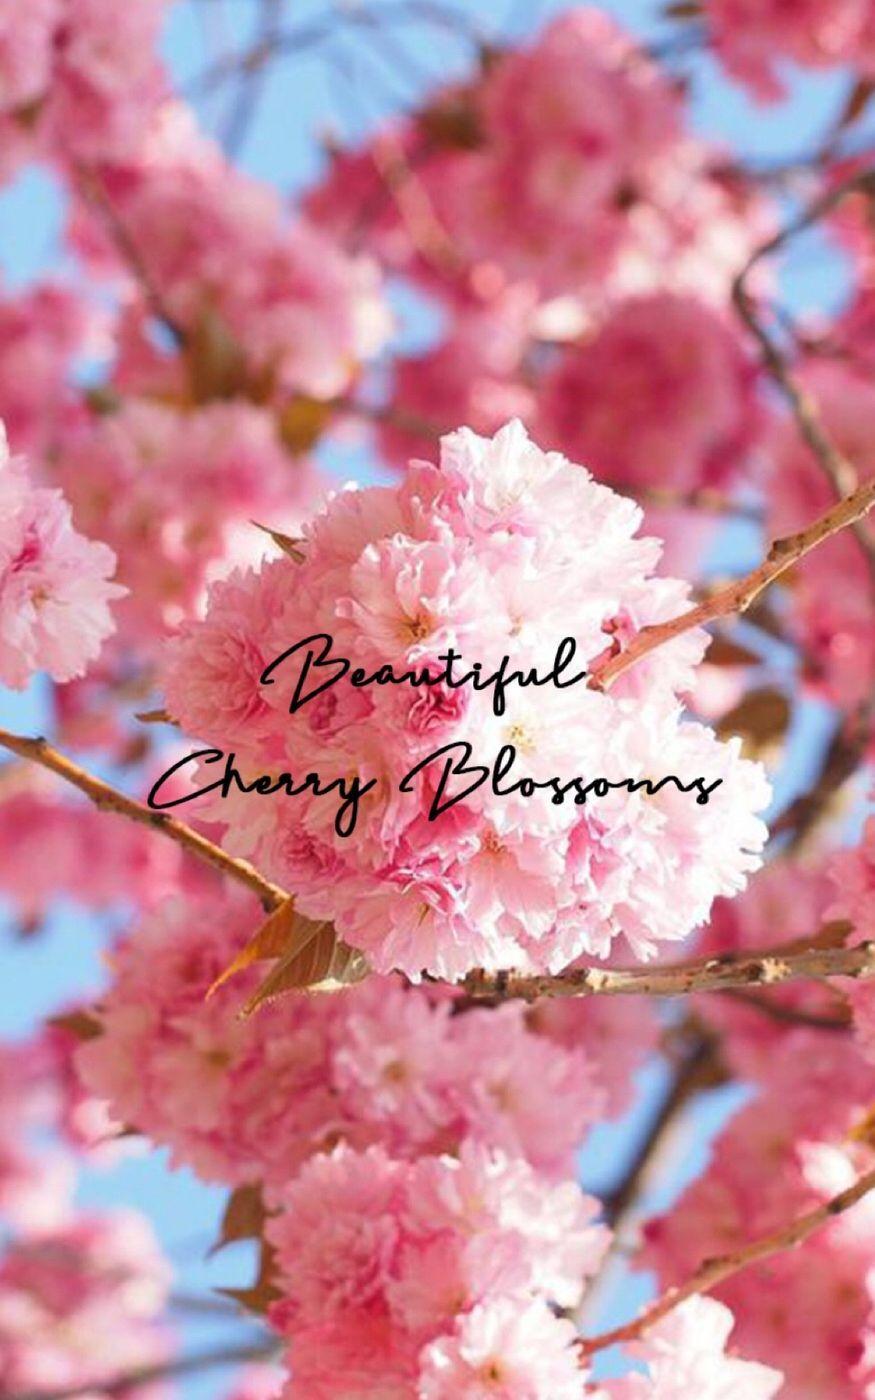 Beautiful Cherry 🍒 Blossoms